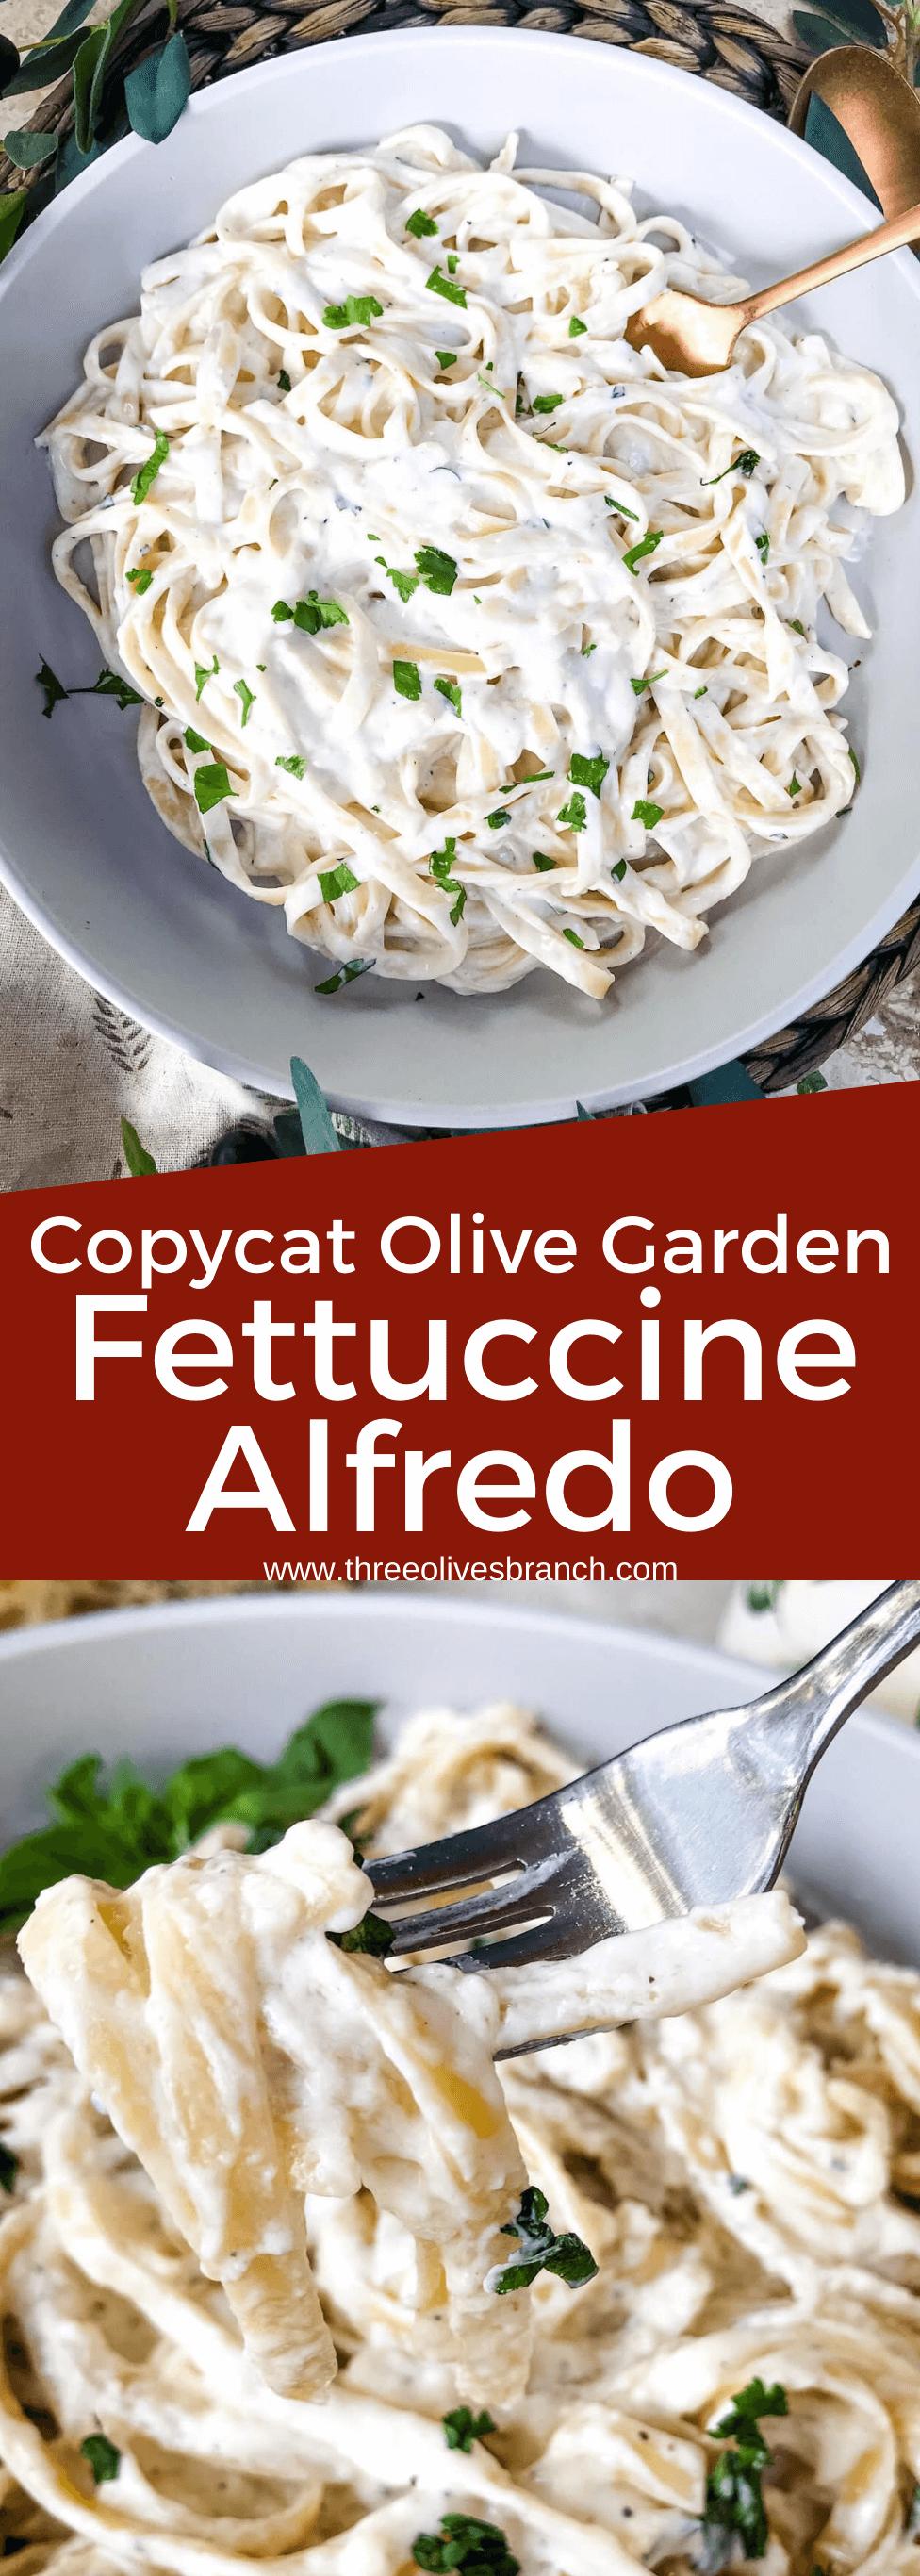 Copycat Olive Garden Fettuccine Alfredo Three Olives